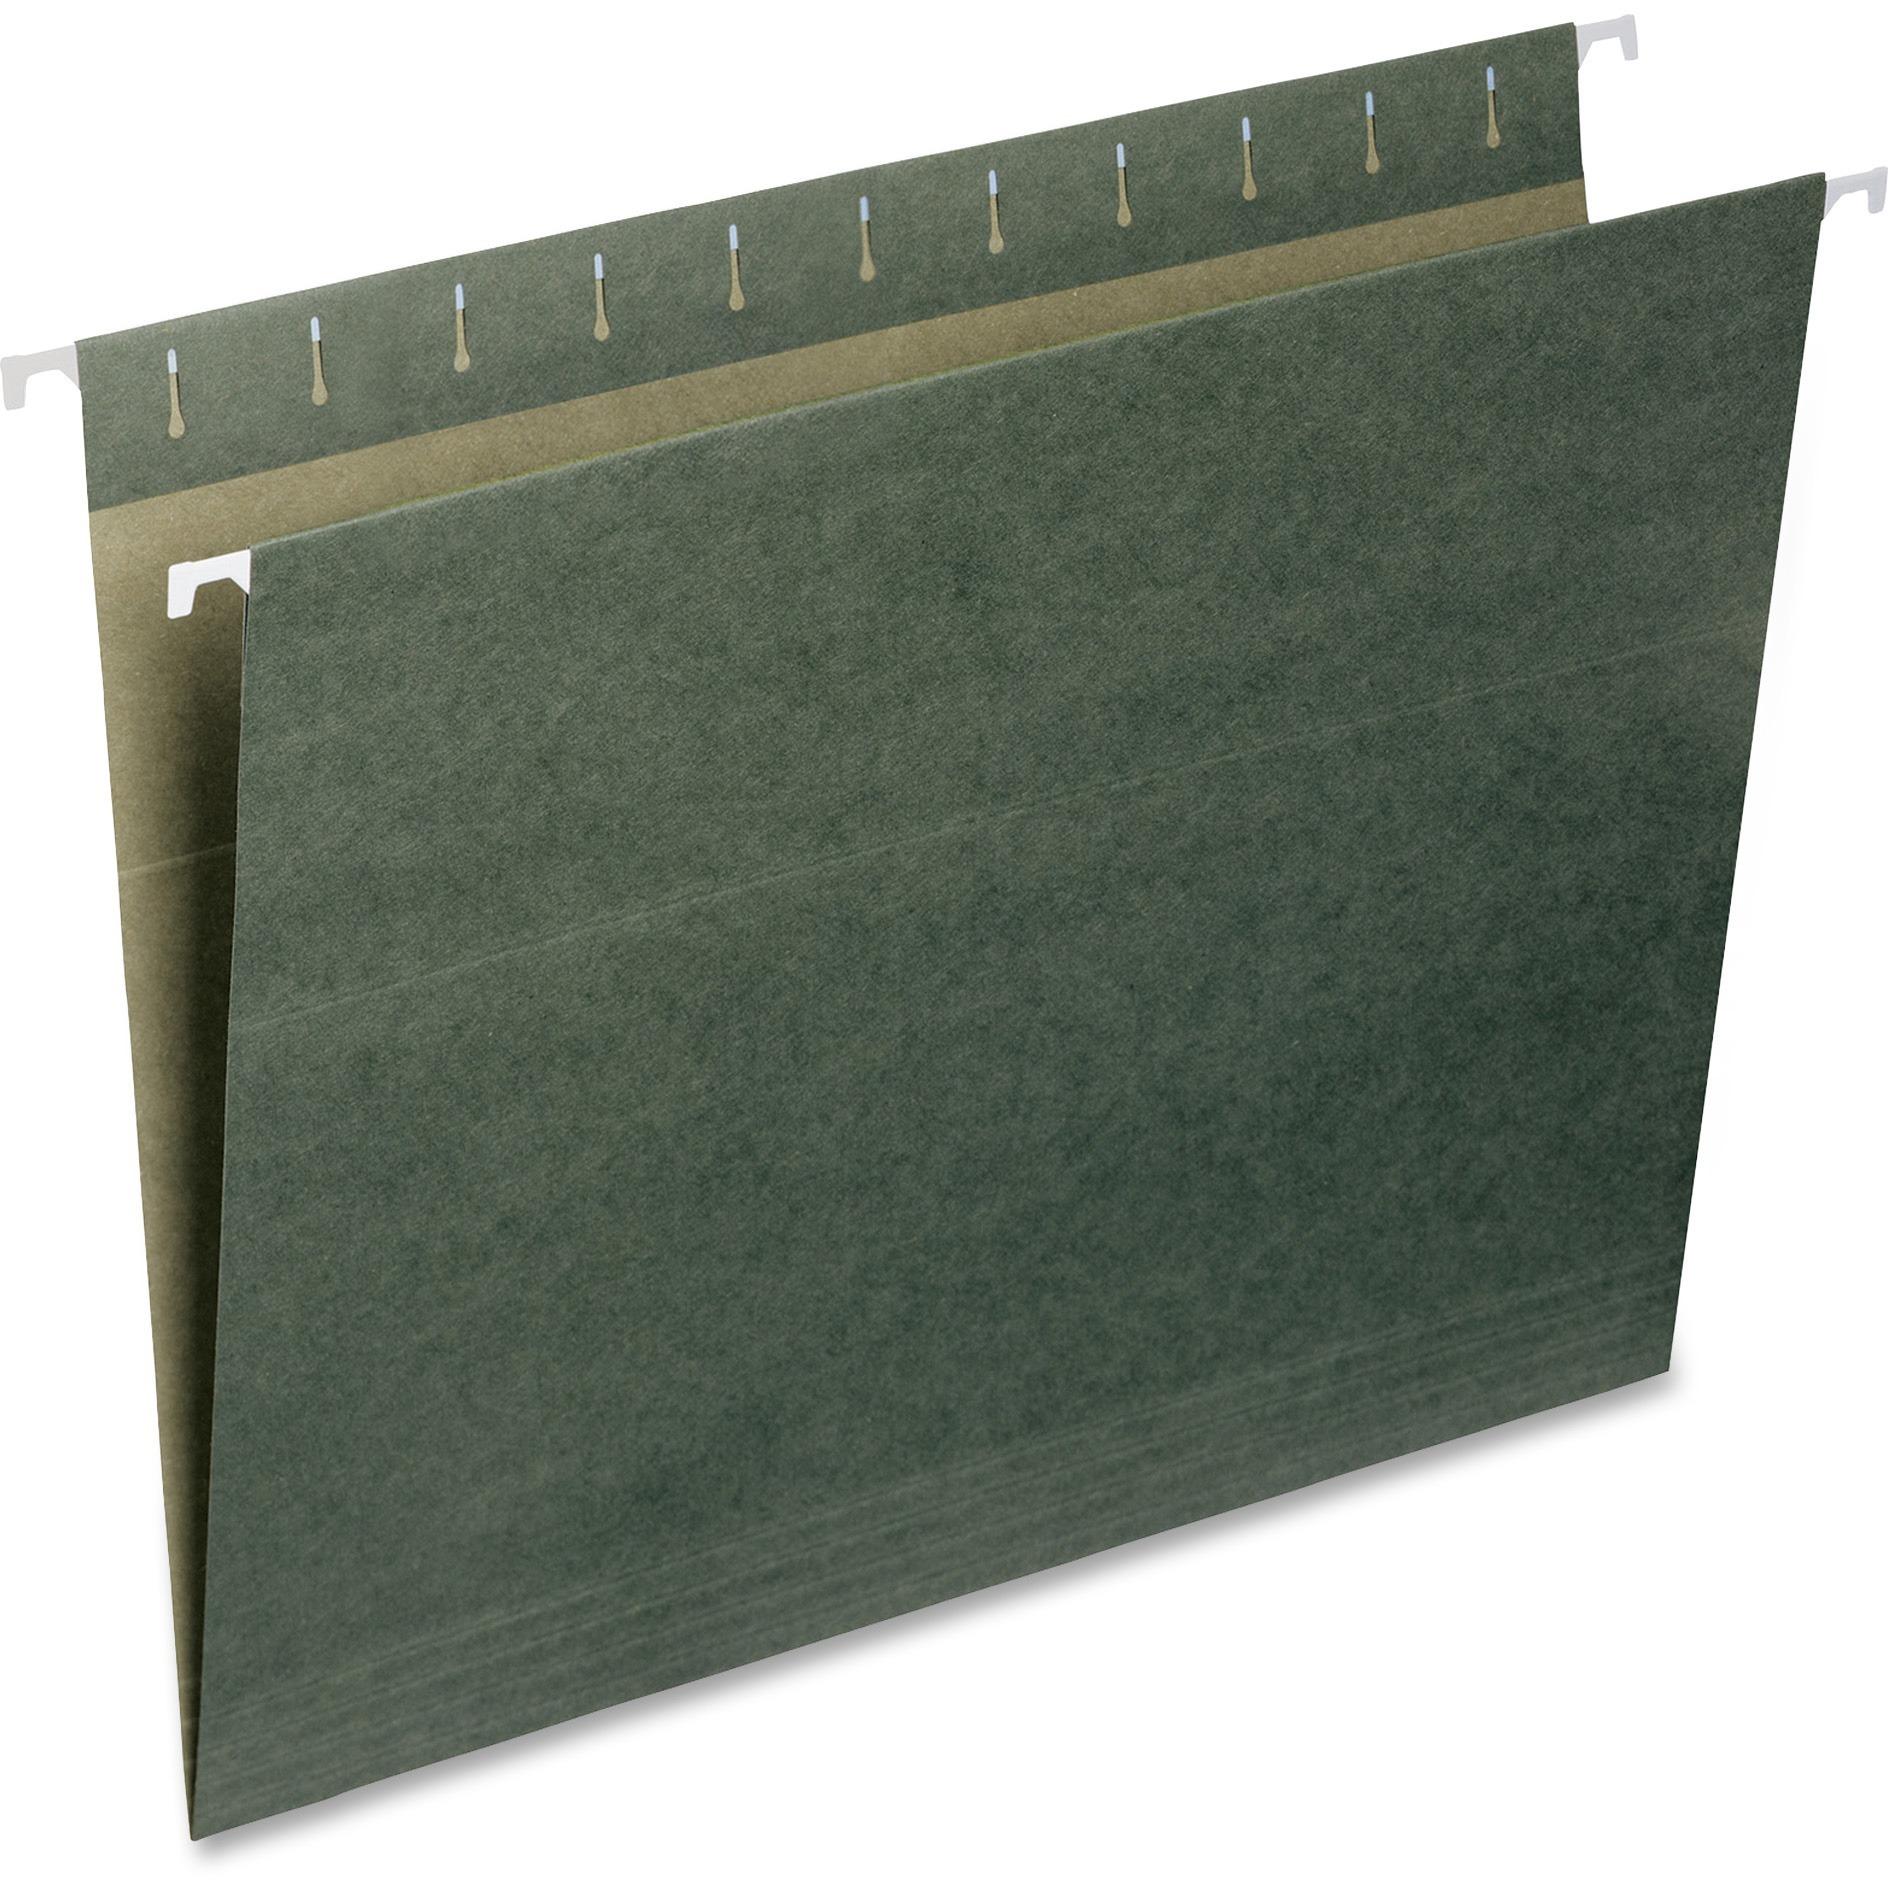 cfc04c21d863 Expanding Folders - Walmart.com